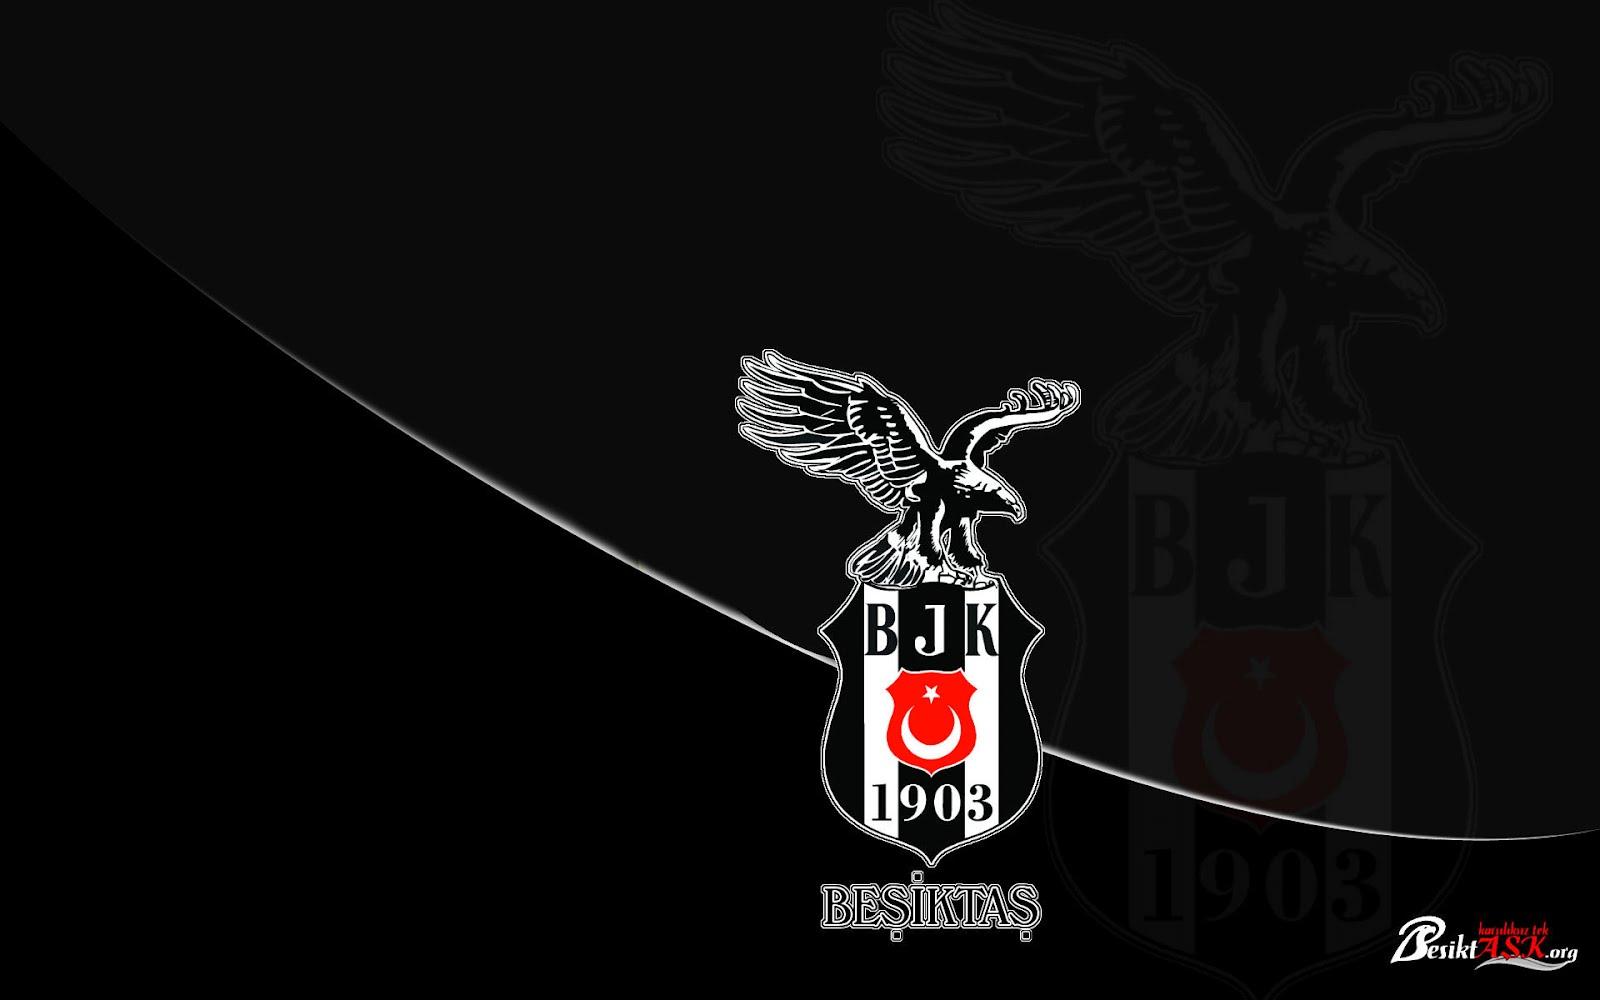 Beşiktaş hd wallpaper